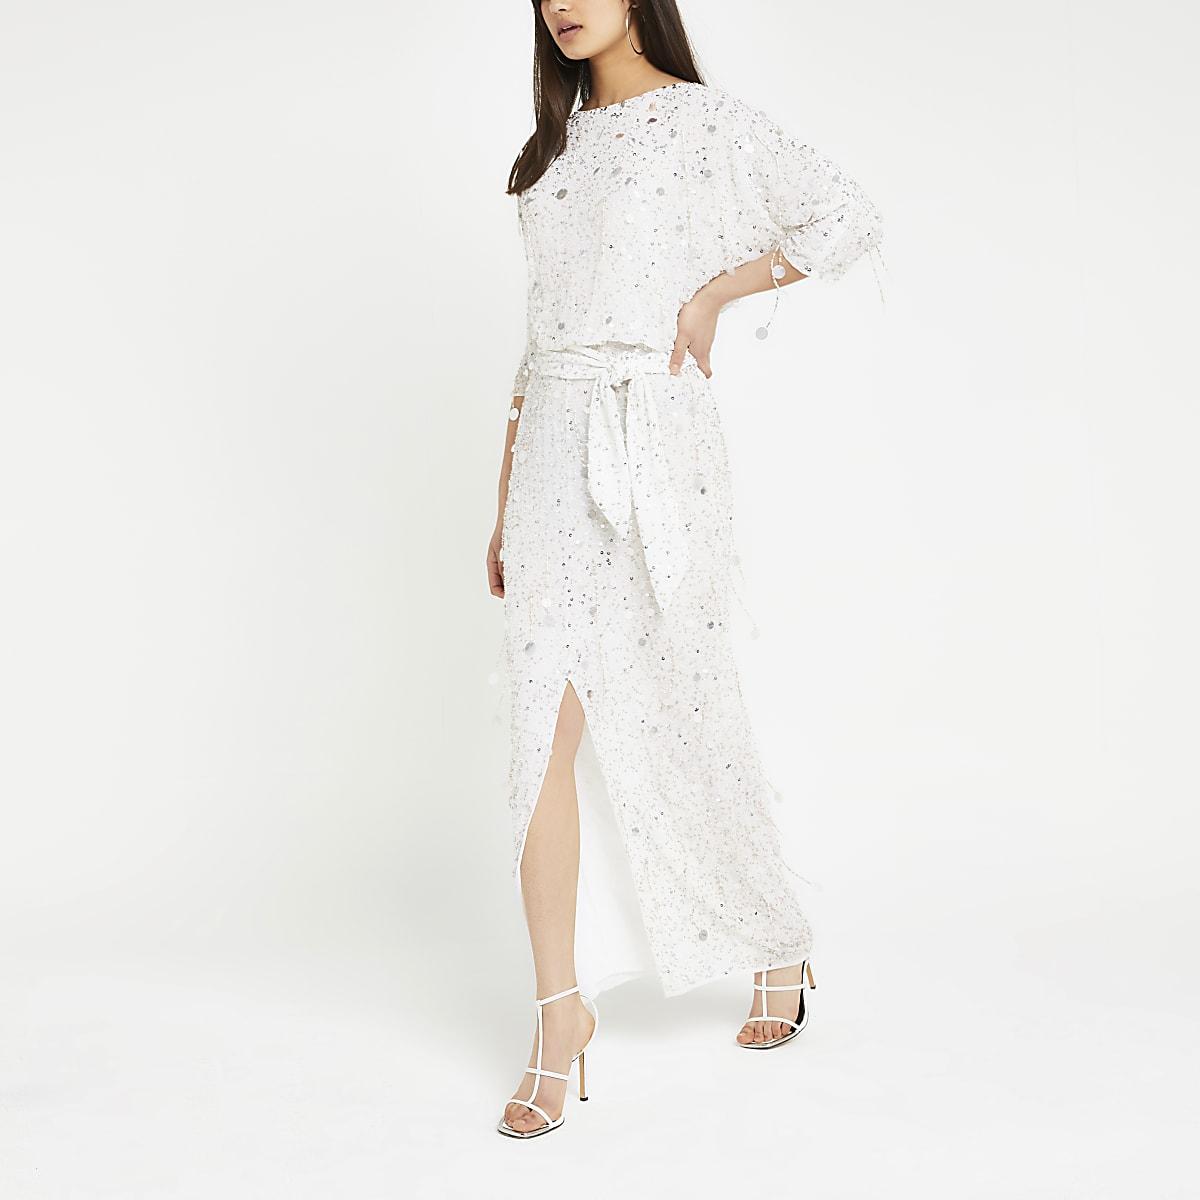 White sequin embellished maxi dress